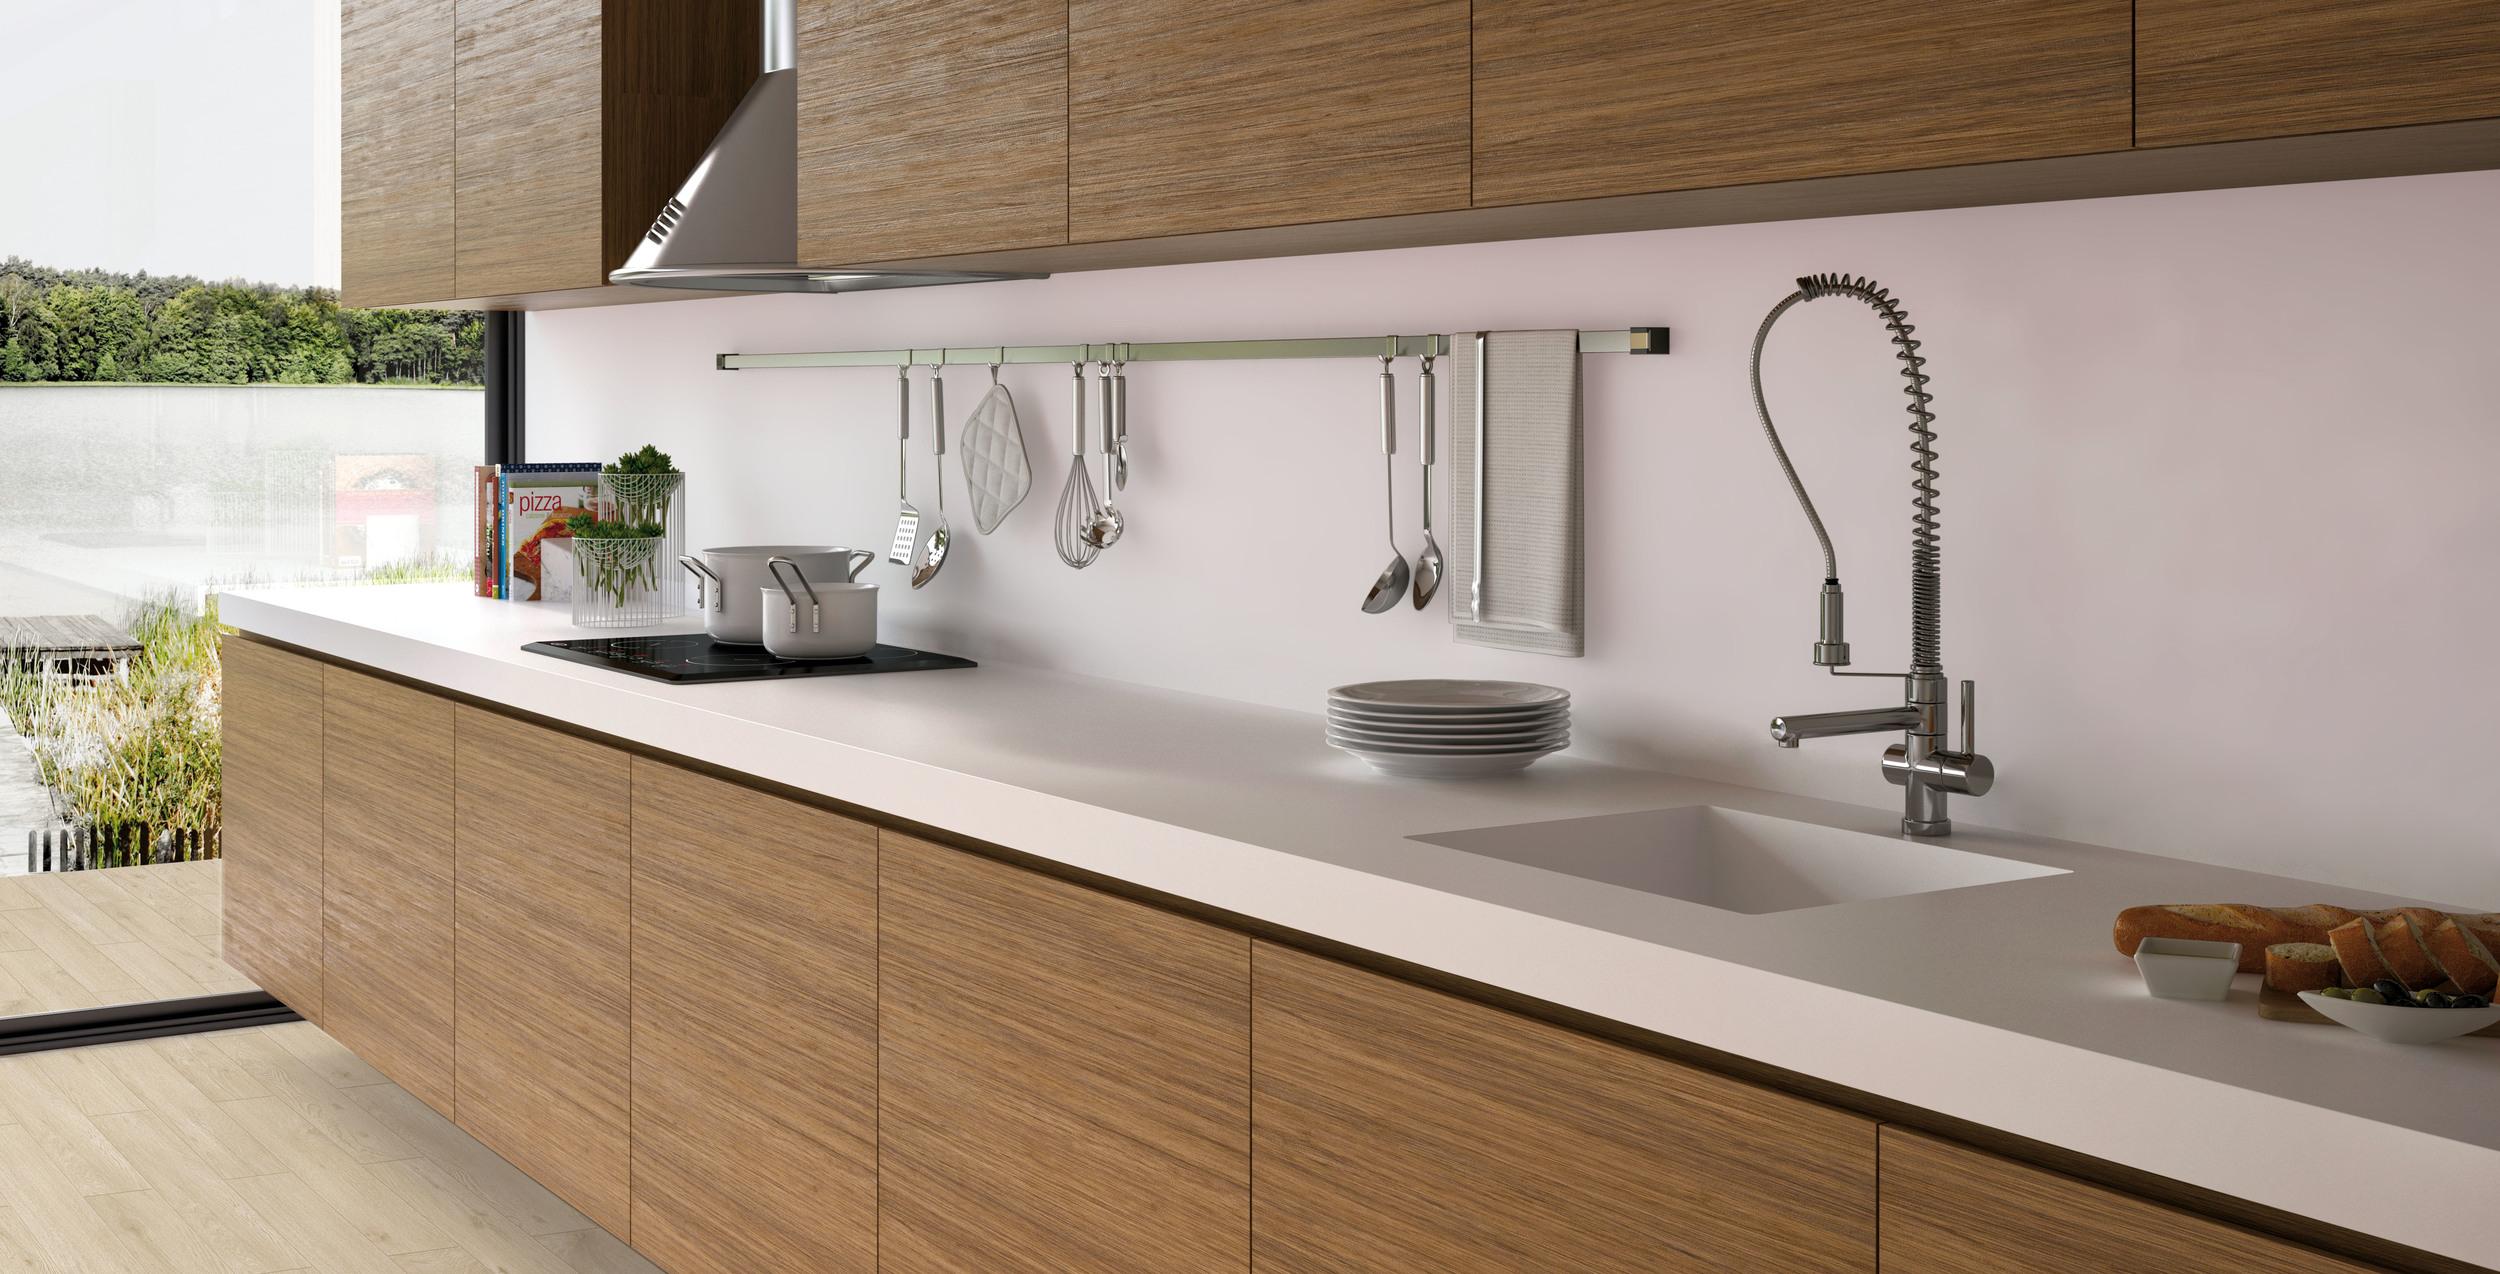 Zenon Ambiente cocina + bois.JPG